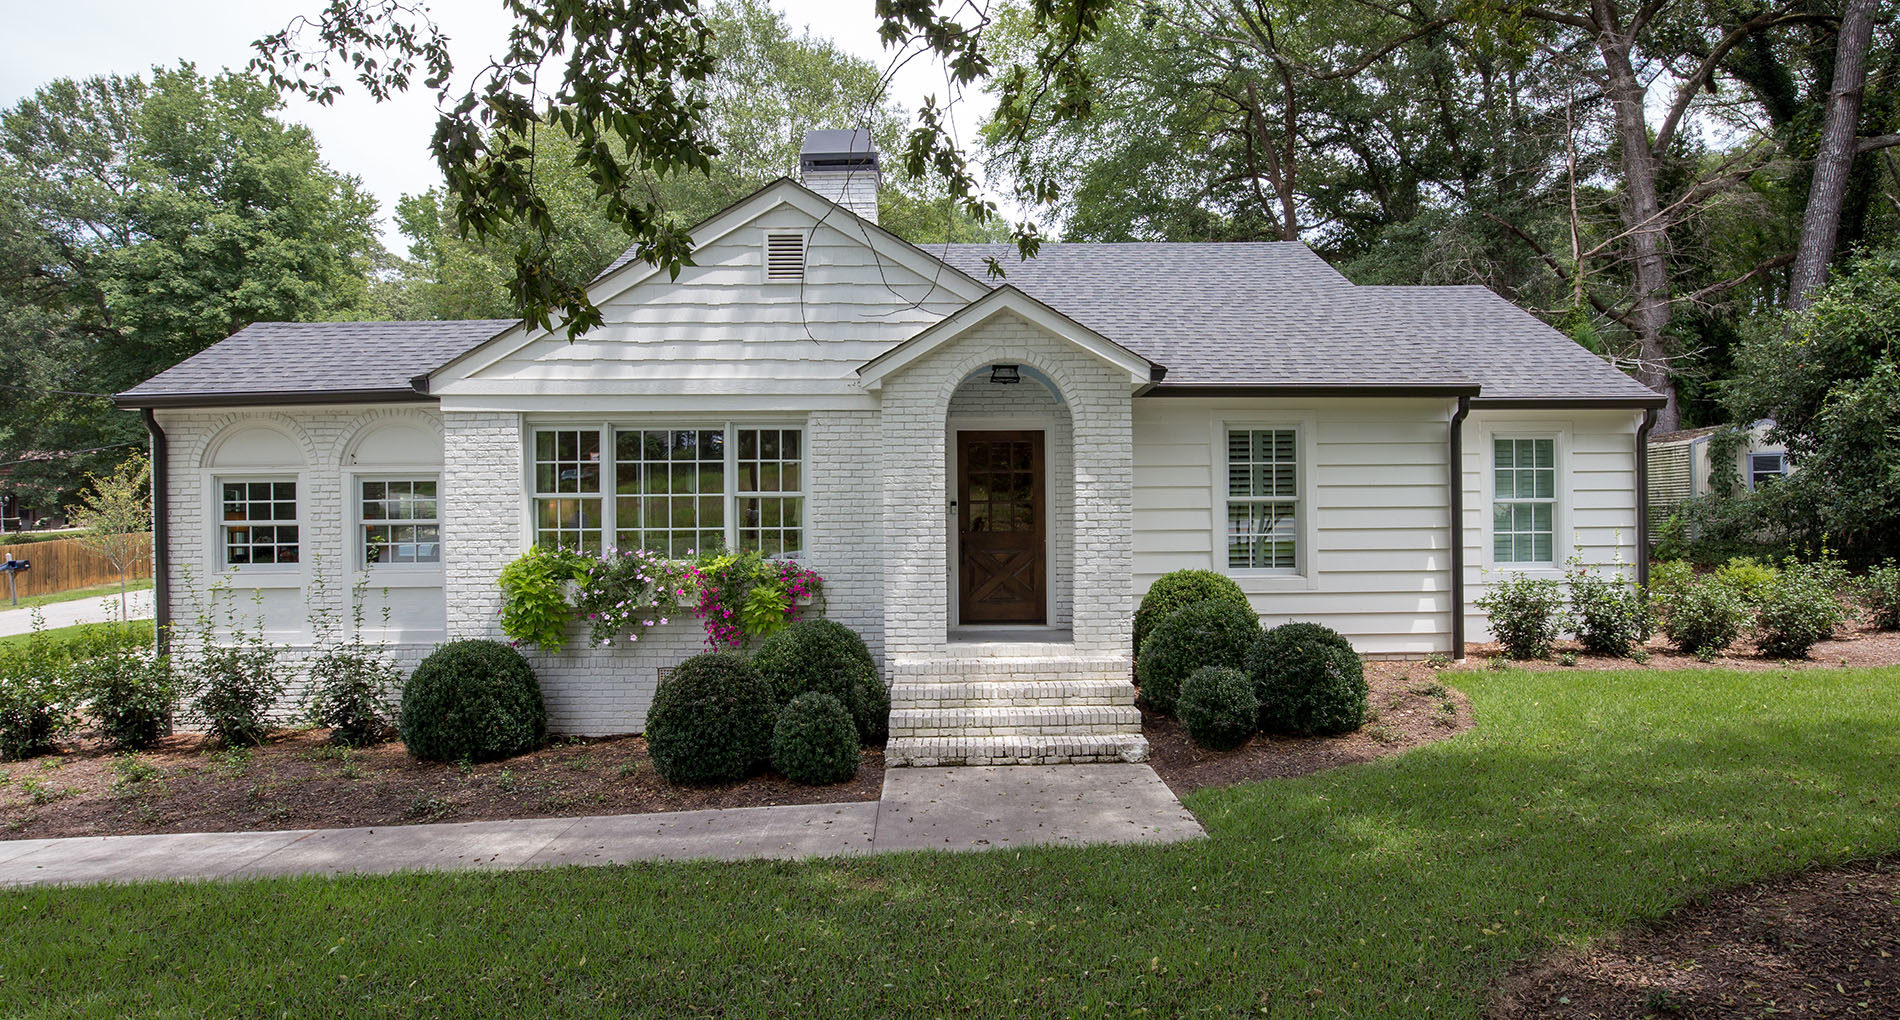 Home Remodel Celmson Clemsonremodel Slider1